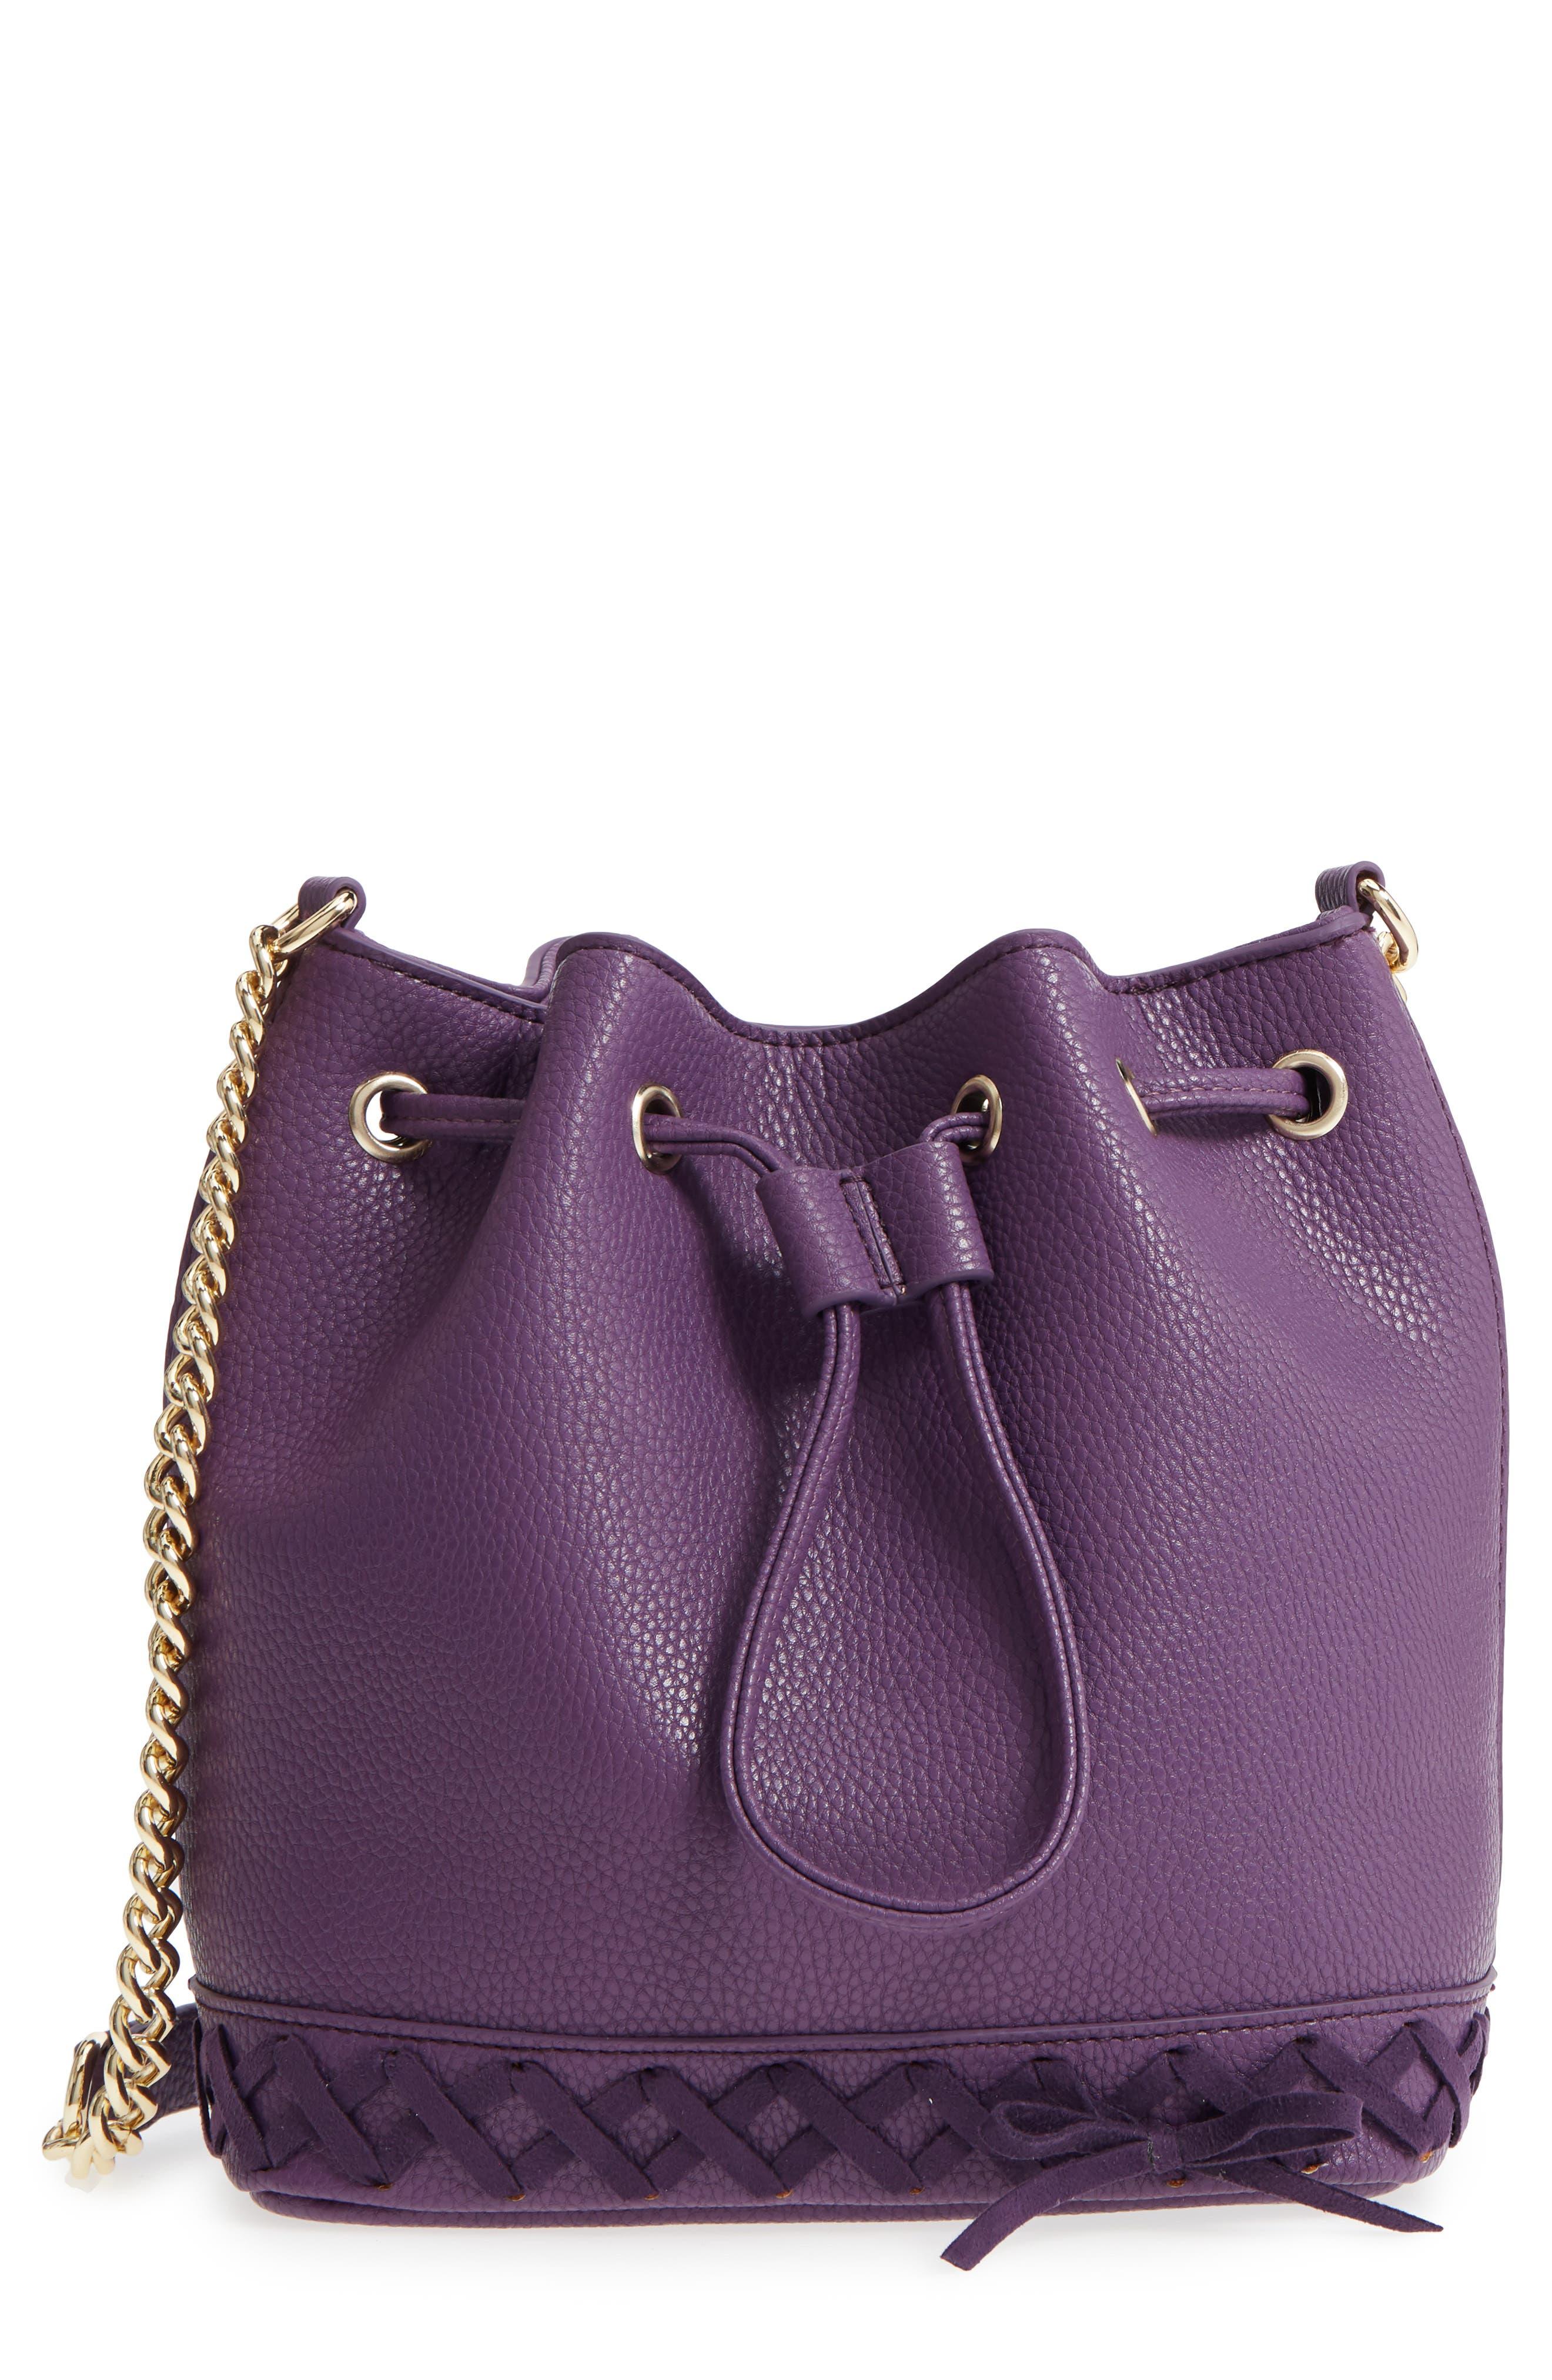 Veronica Faux Leather Bucket Bag,                             Main thumbnail 1, color,                             Purple